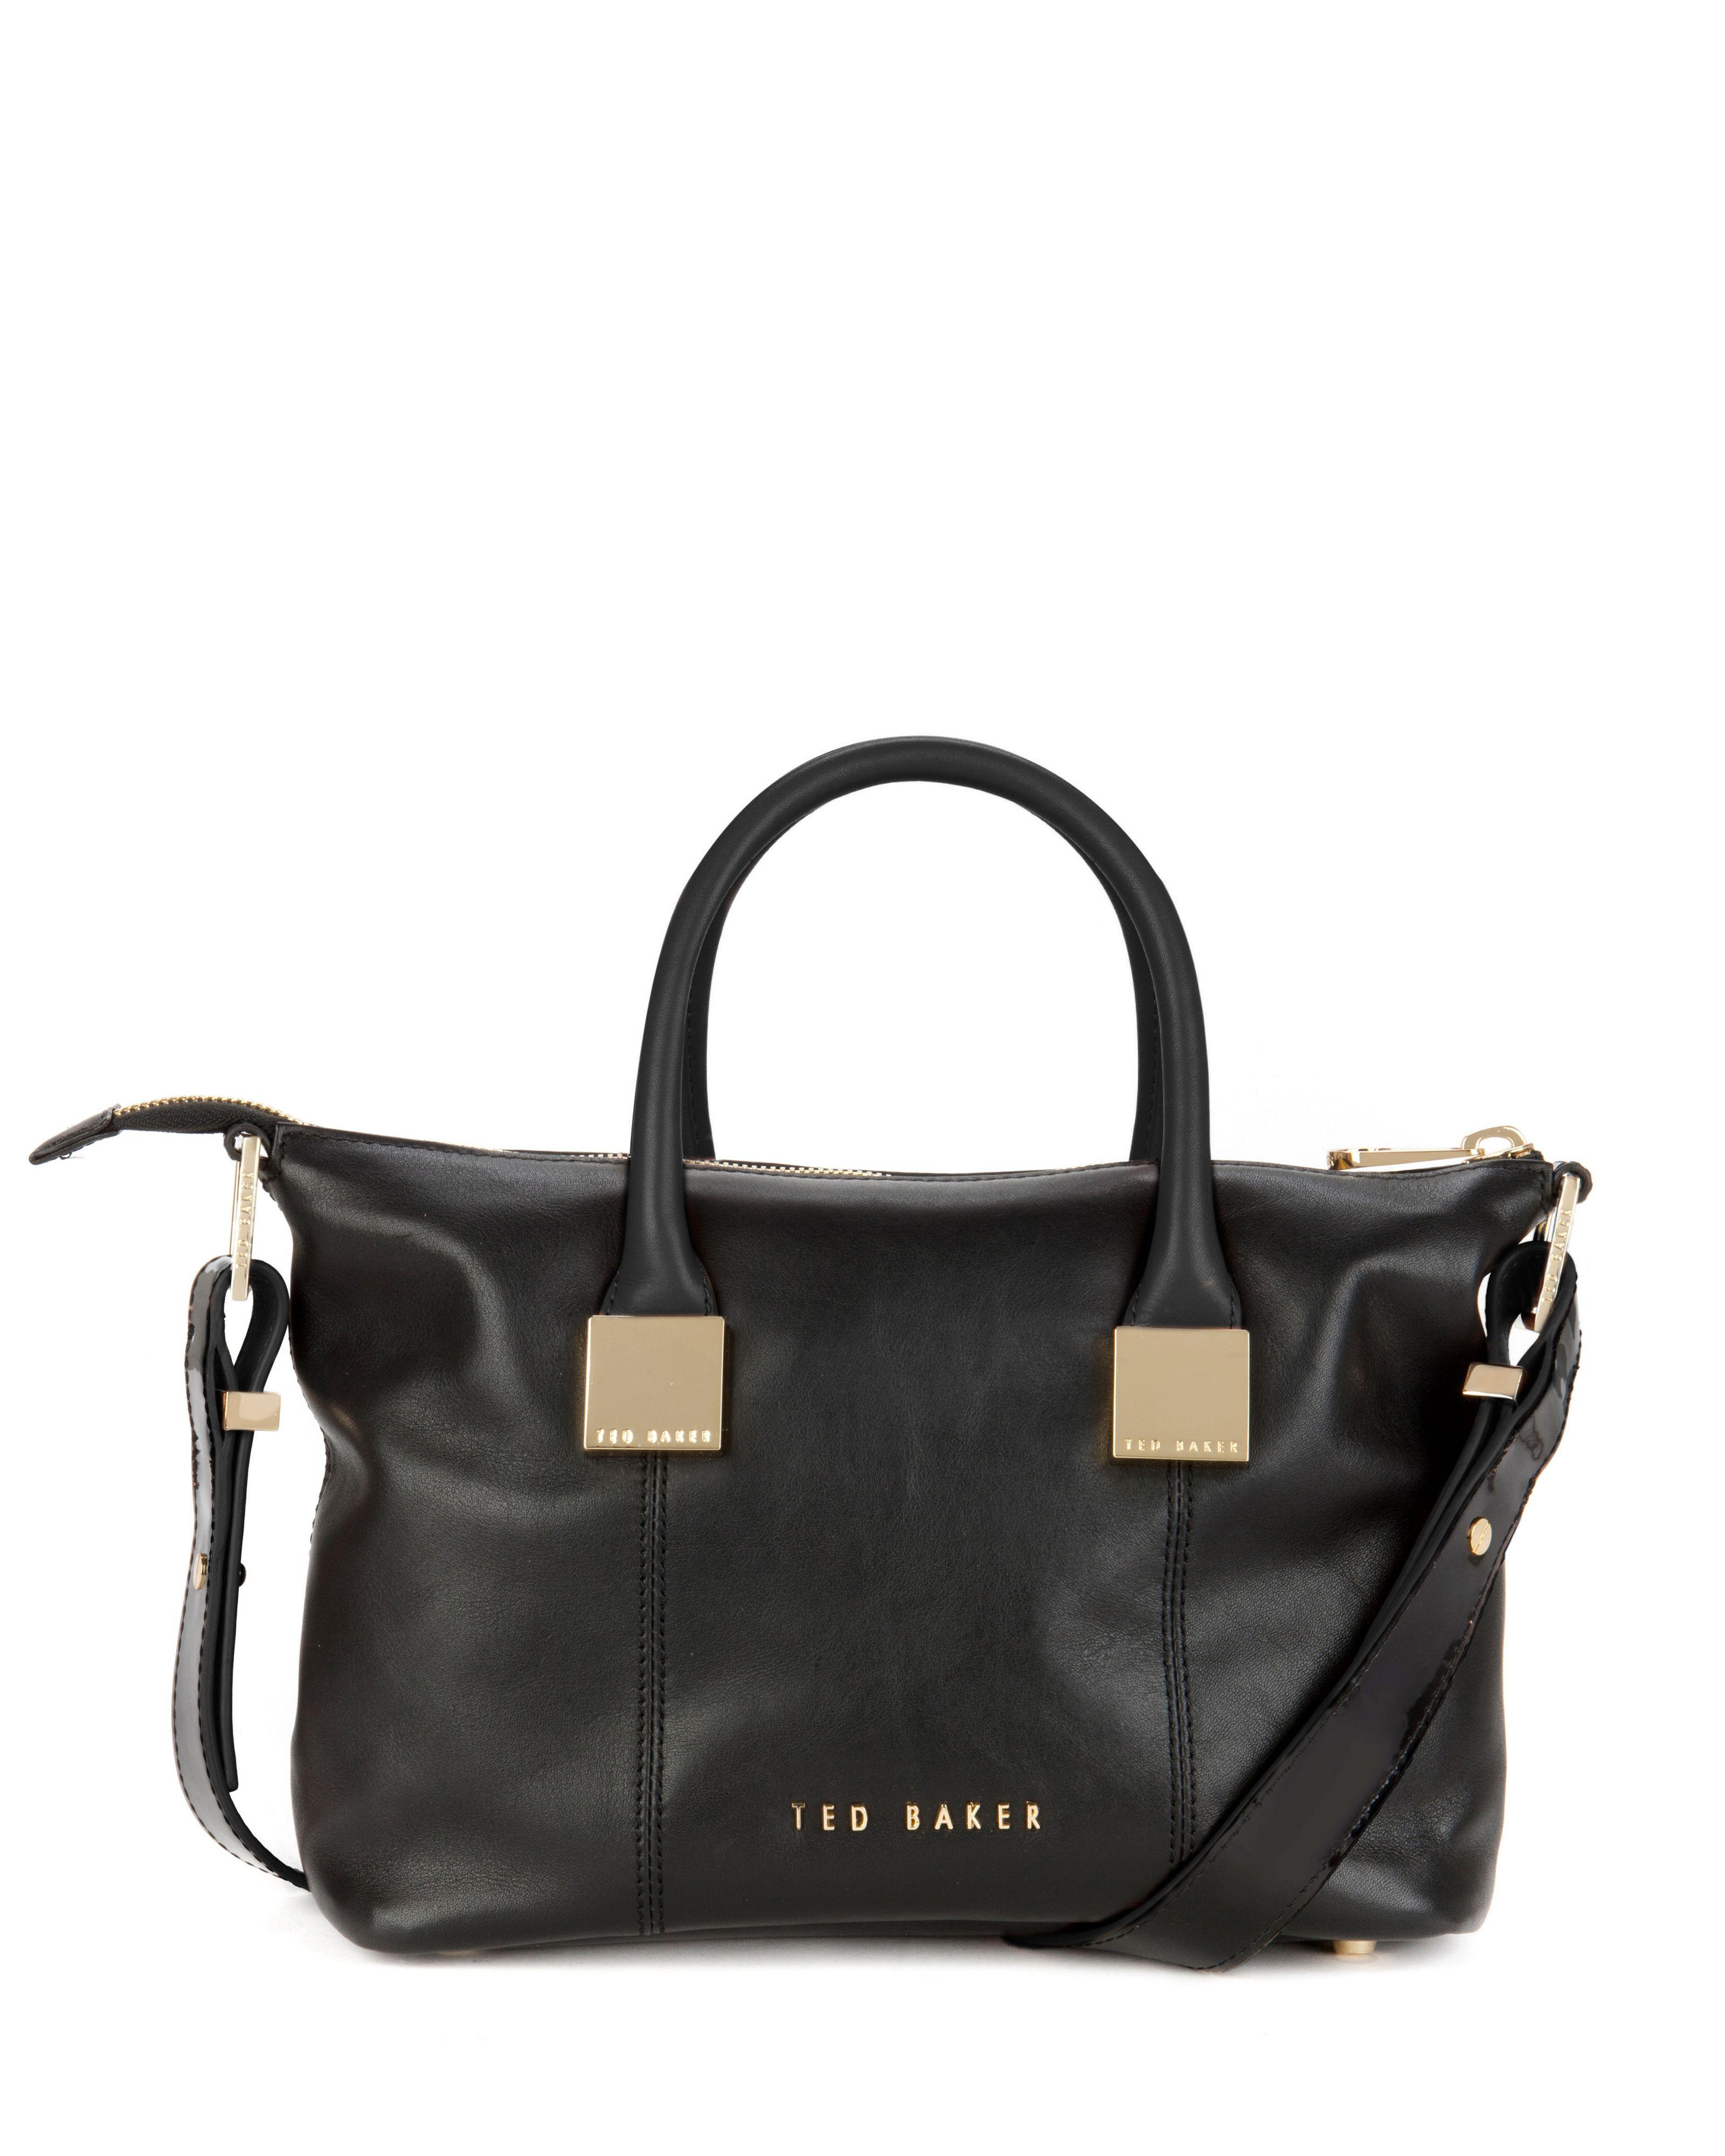 dde421f13b Ted Baker Felmar Small Leather Tote Bag in Black   Lyst